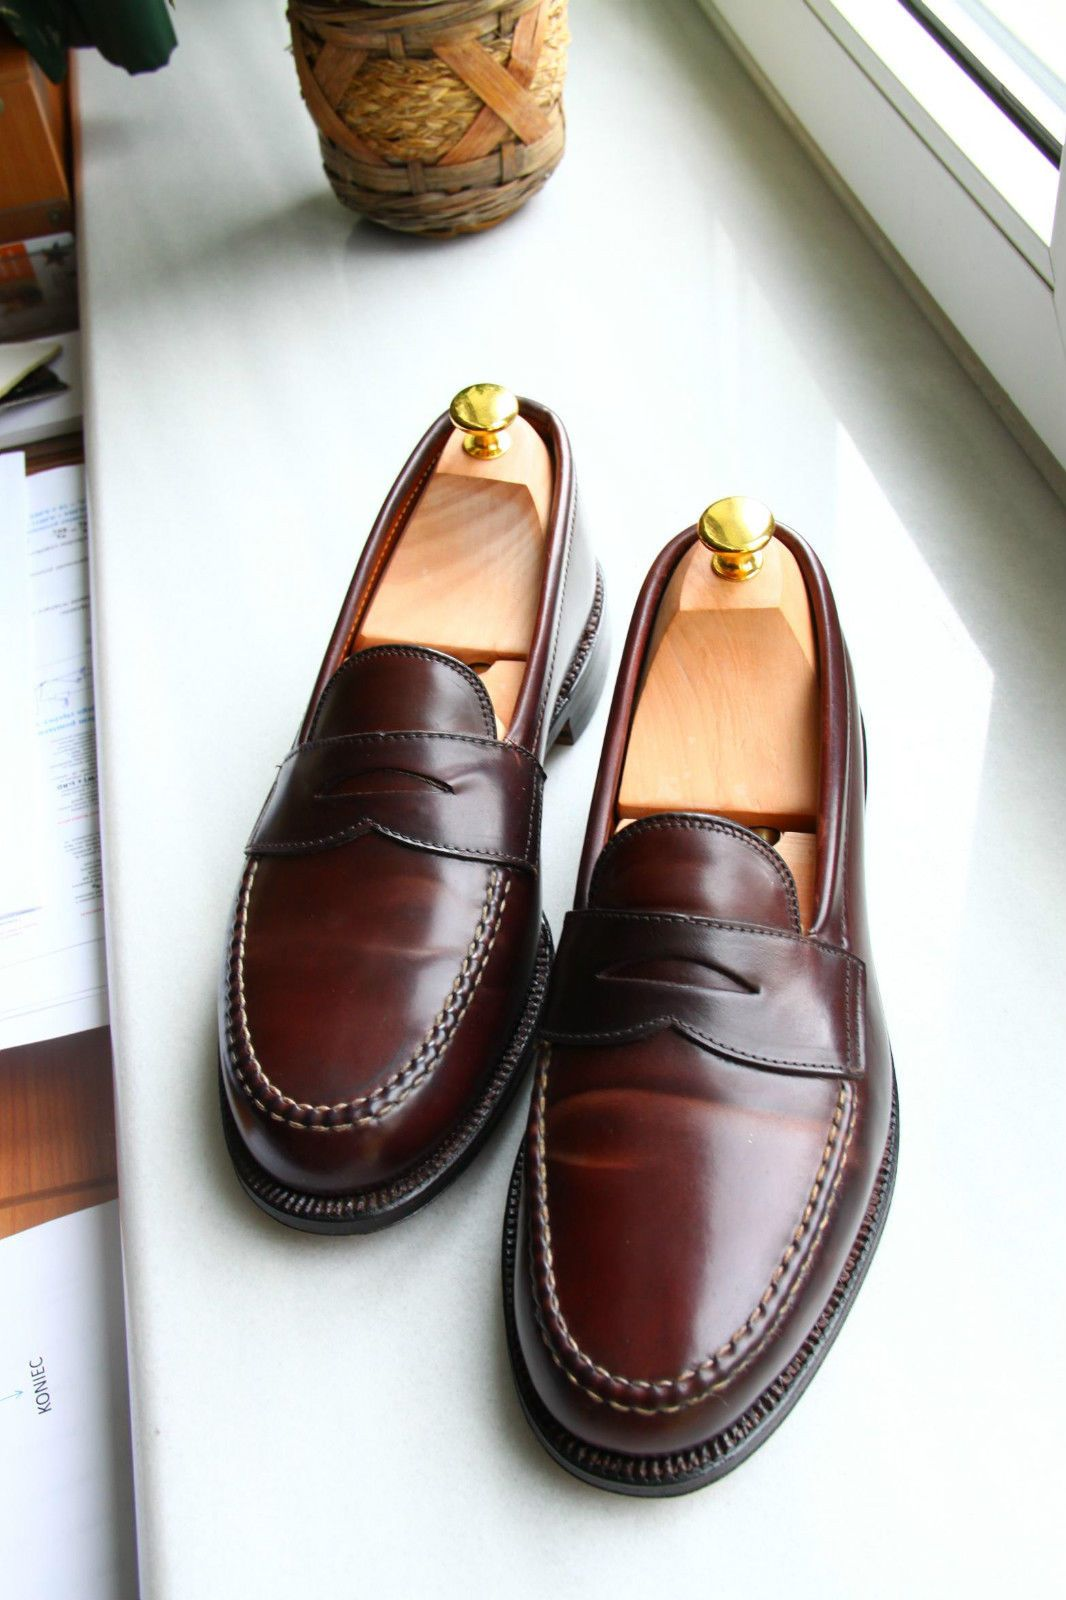 b40e829a20e Alden penny loafers